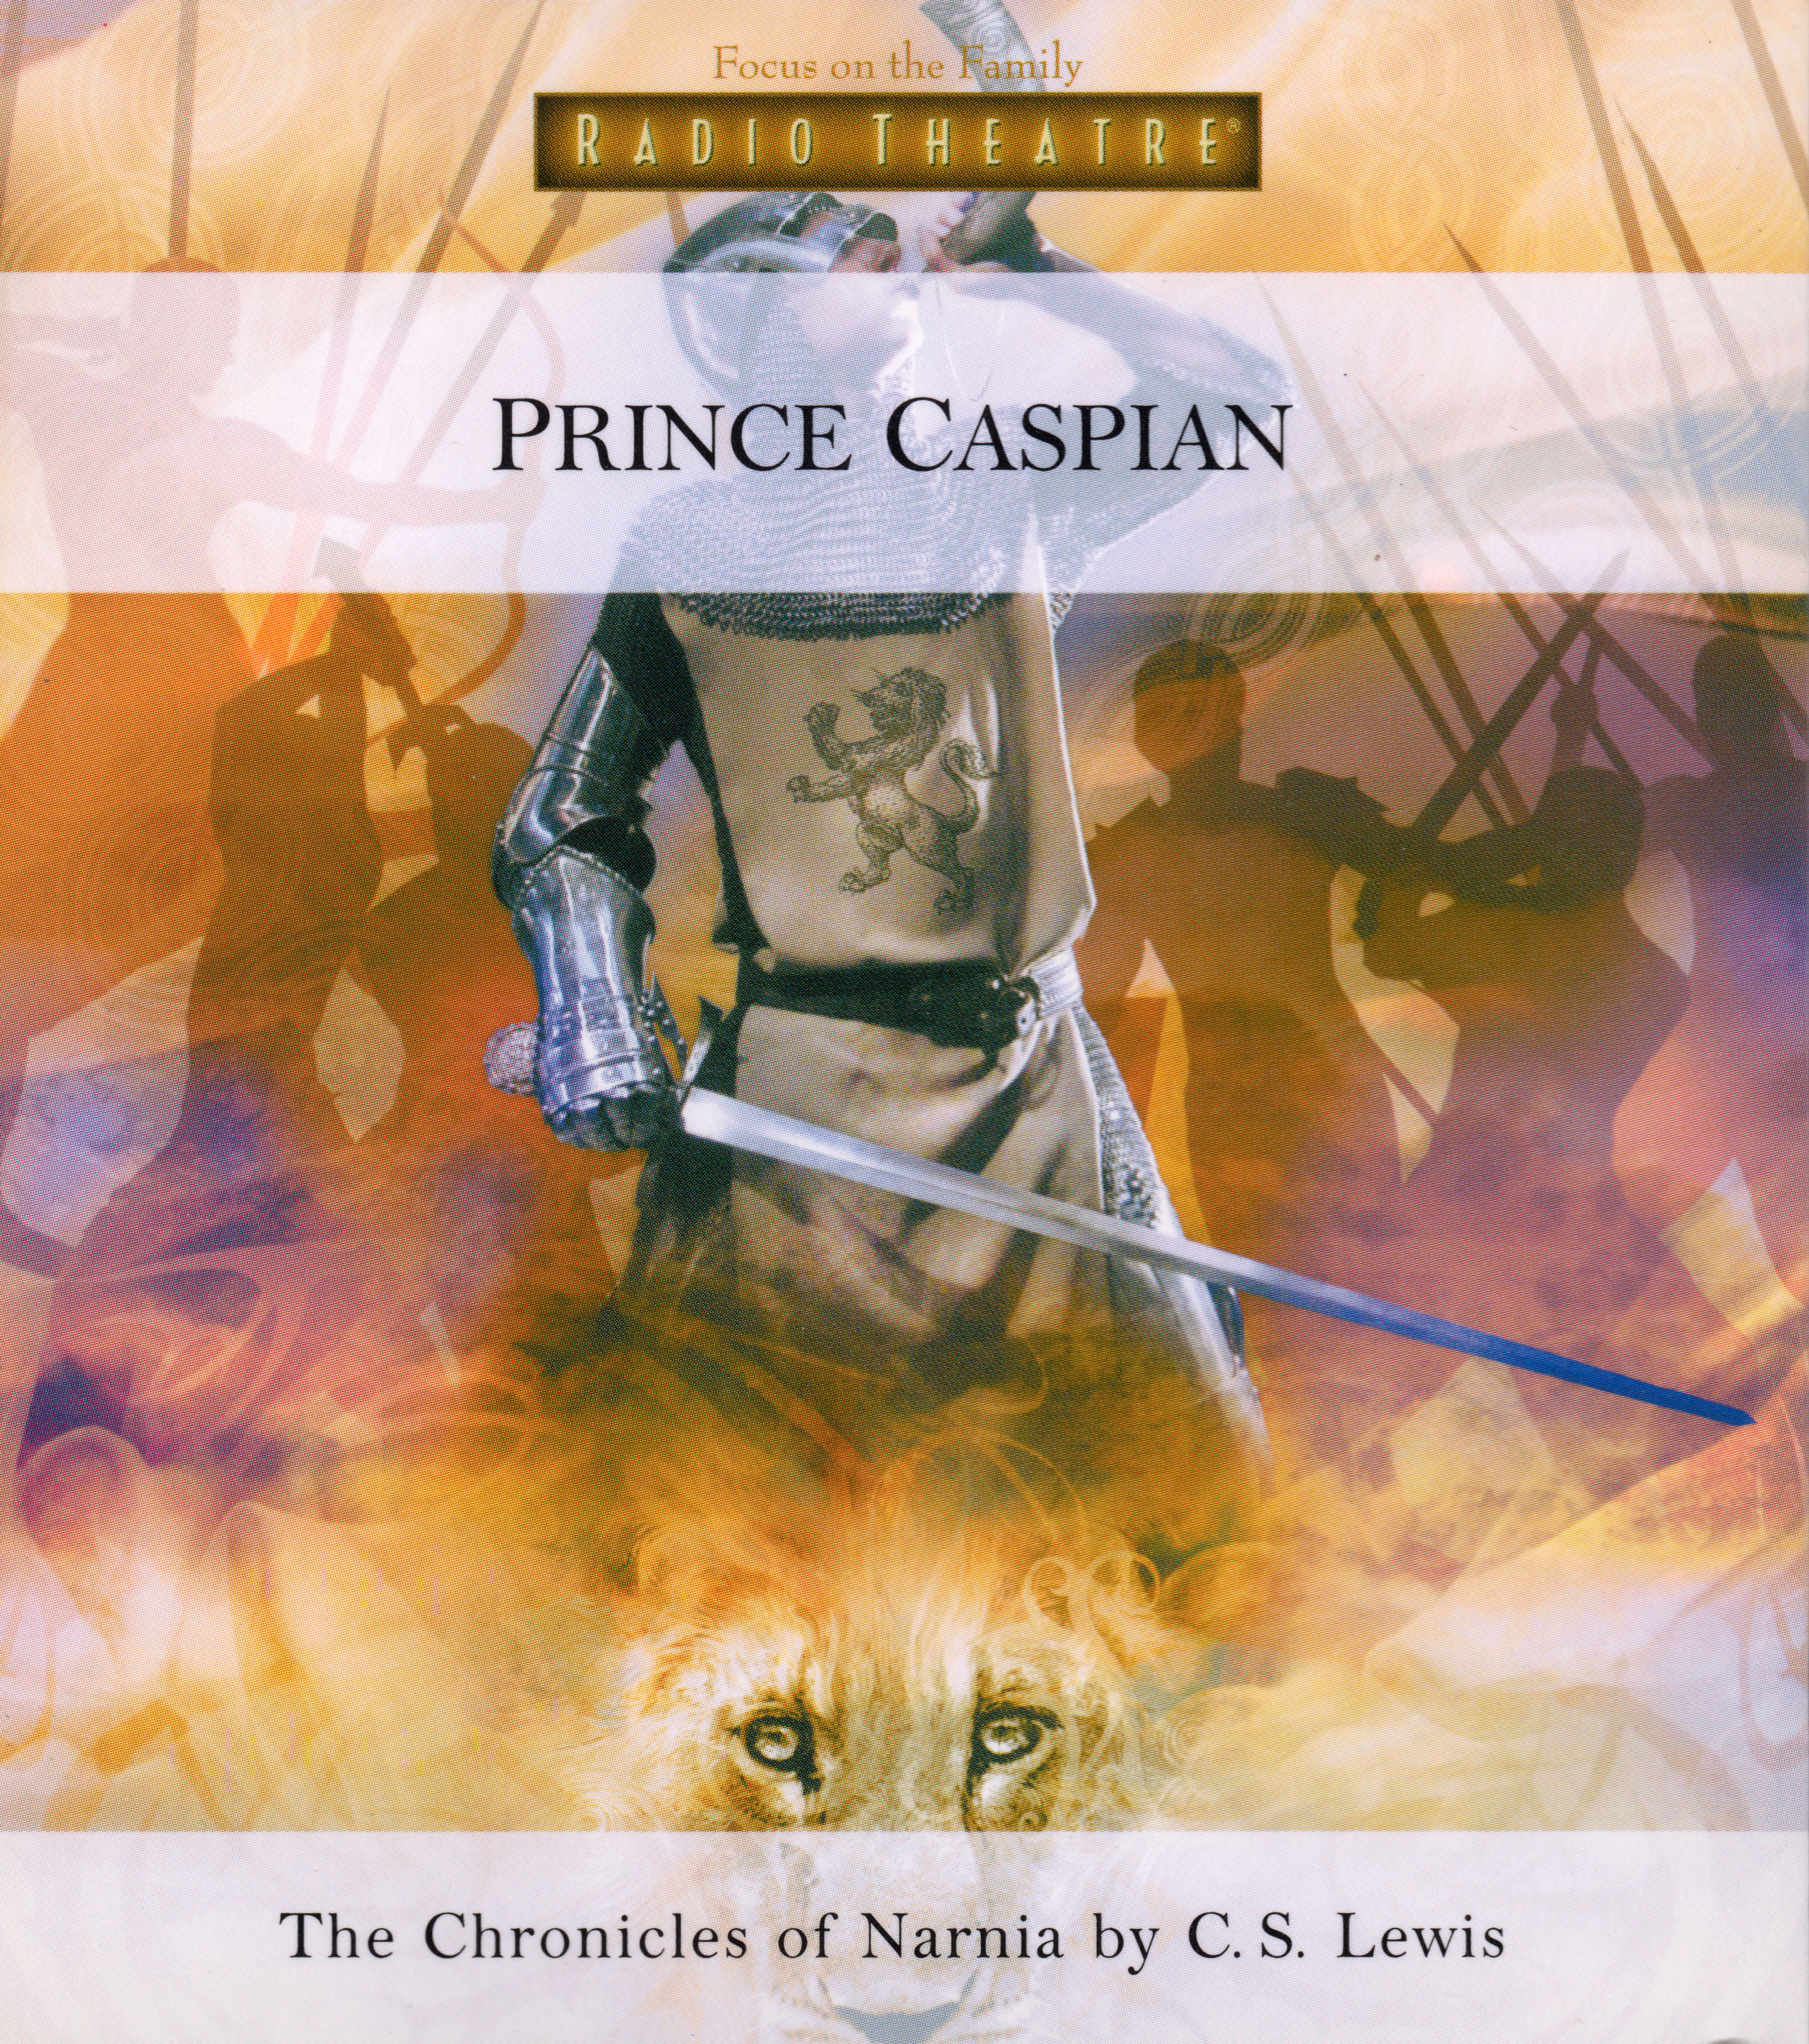 Prince Caspian (Focus on the Family Radio Theatre)